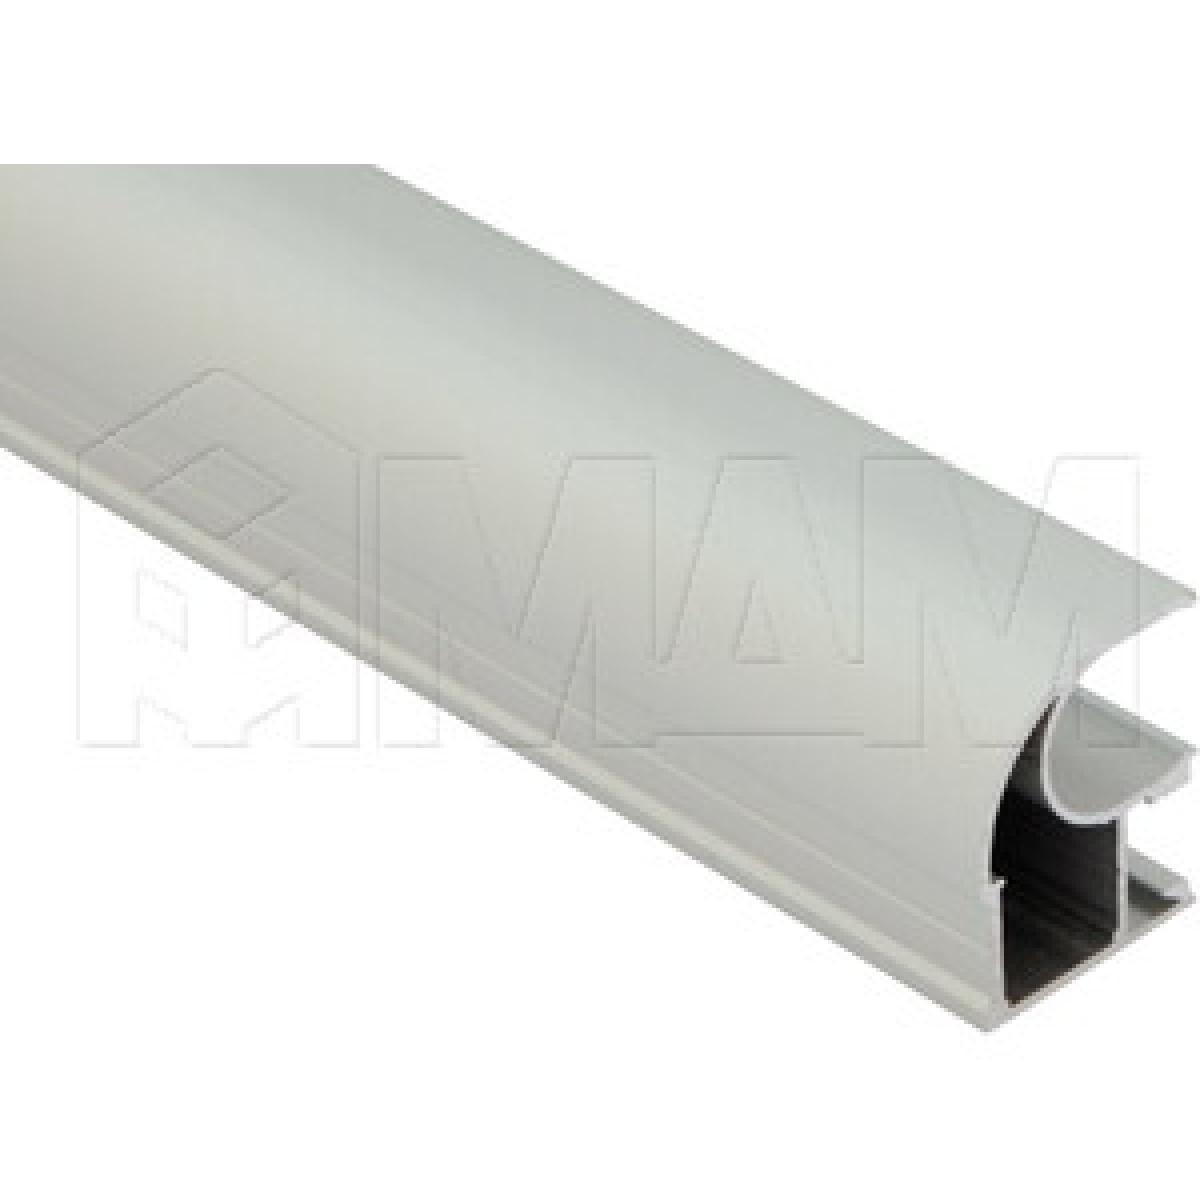 INTEGRO Профиль-ручка асим. серебро, L-5400